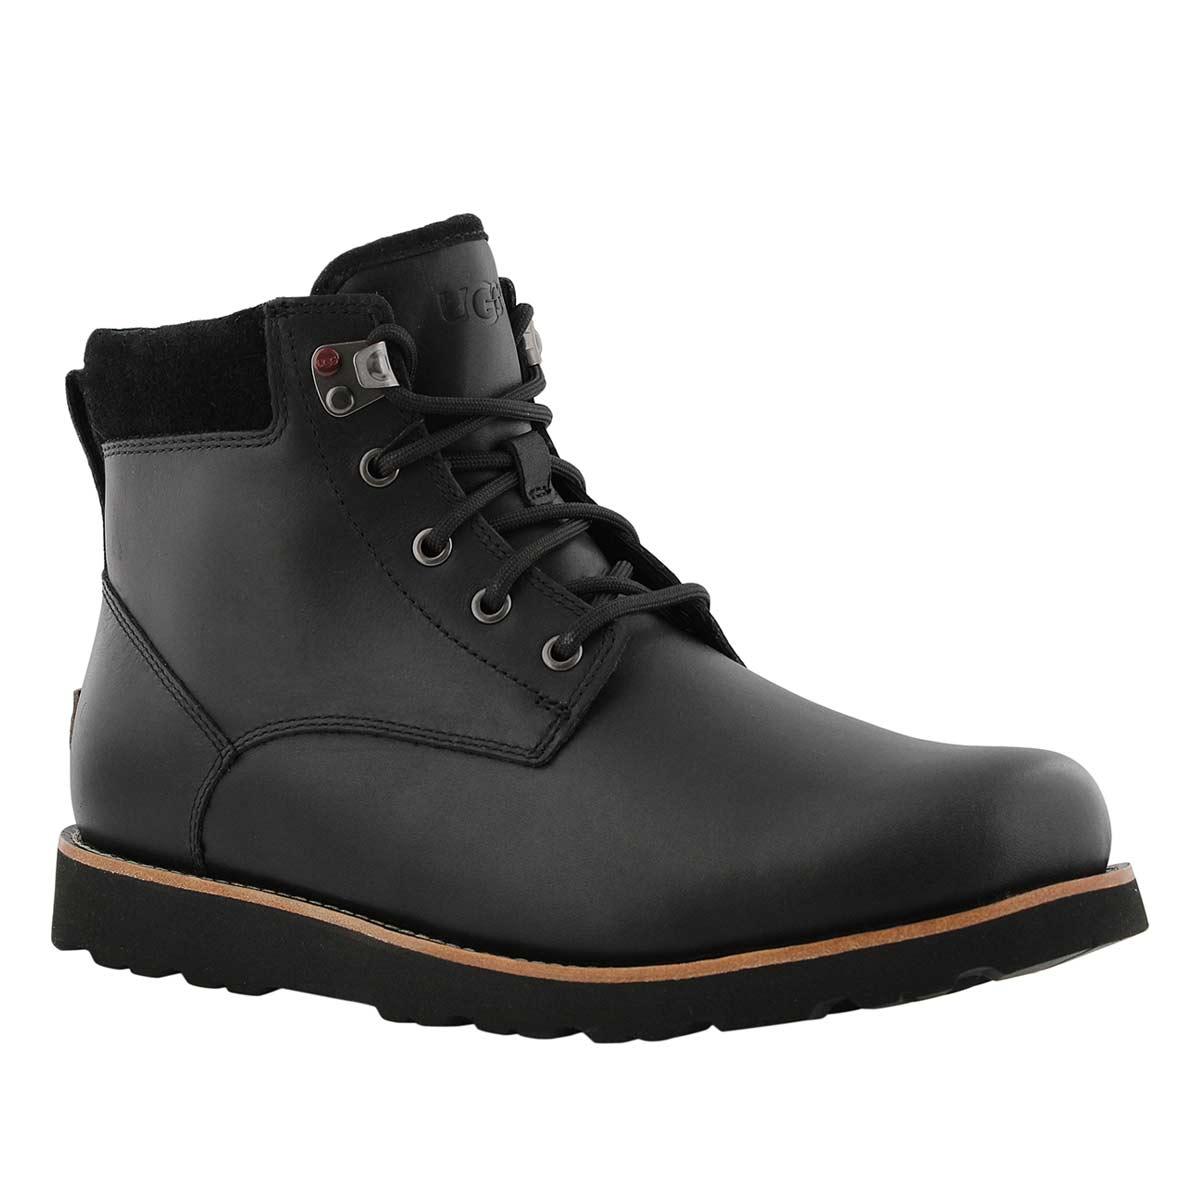 a9530f4175d UGG Men's SETON TL black waterproof casual bo | Softmoc.com